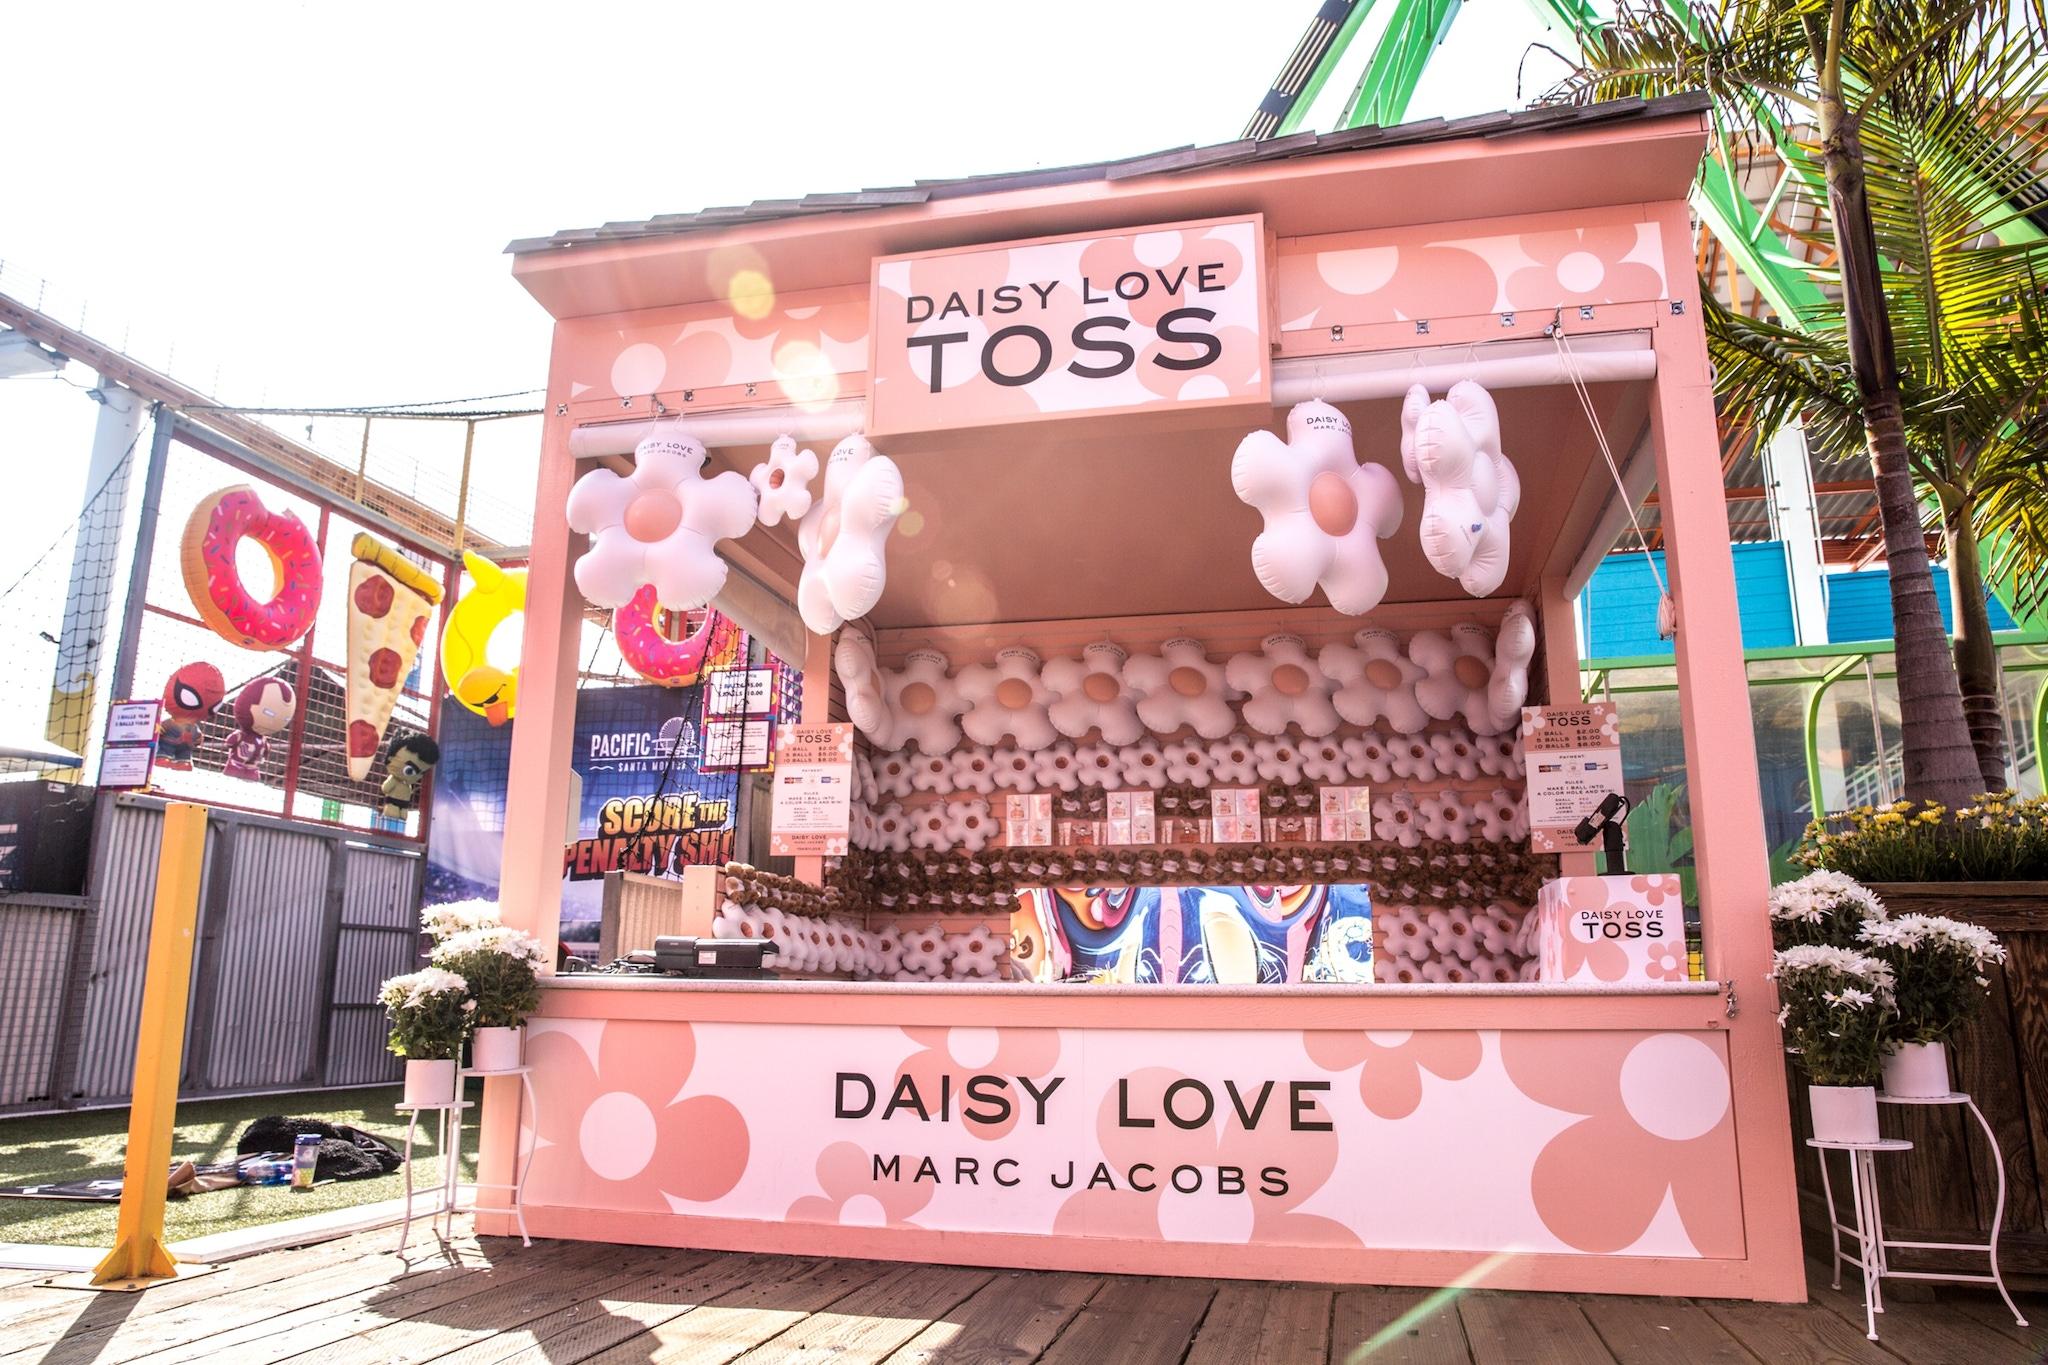 Daisy branded tent